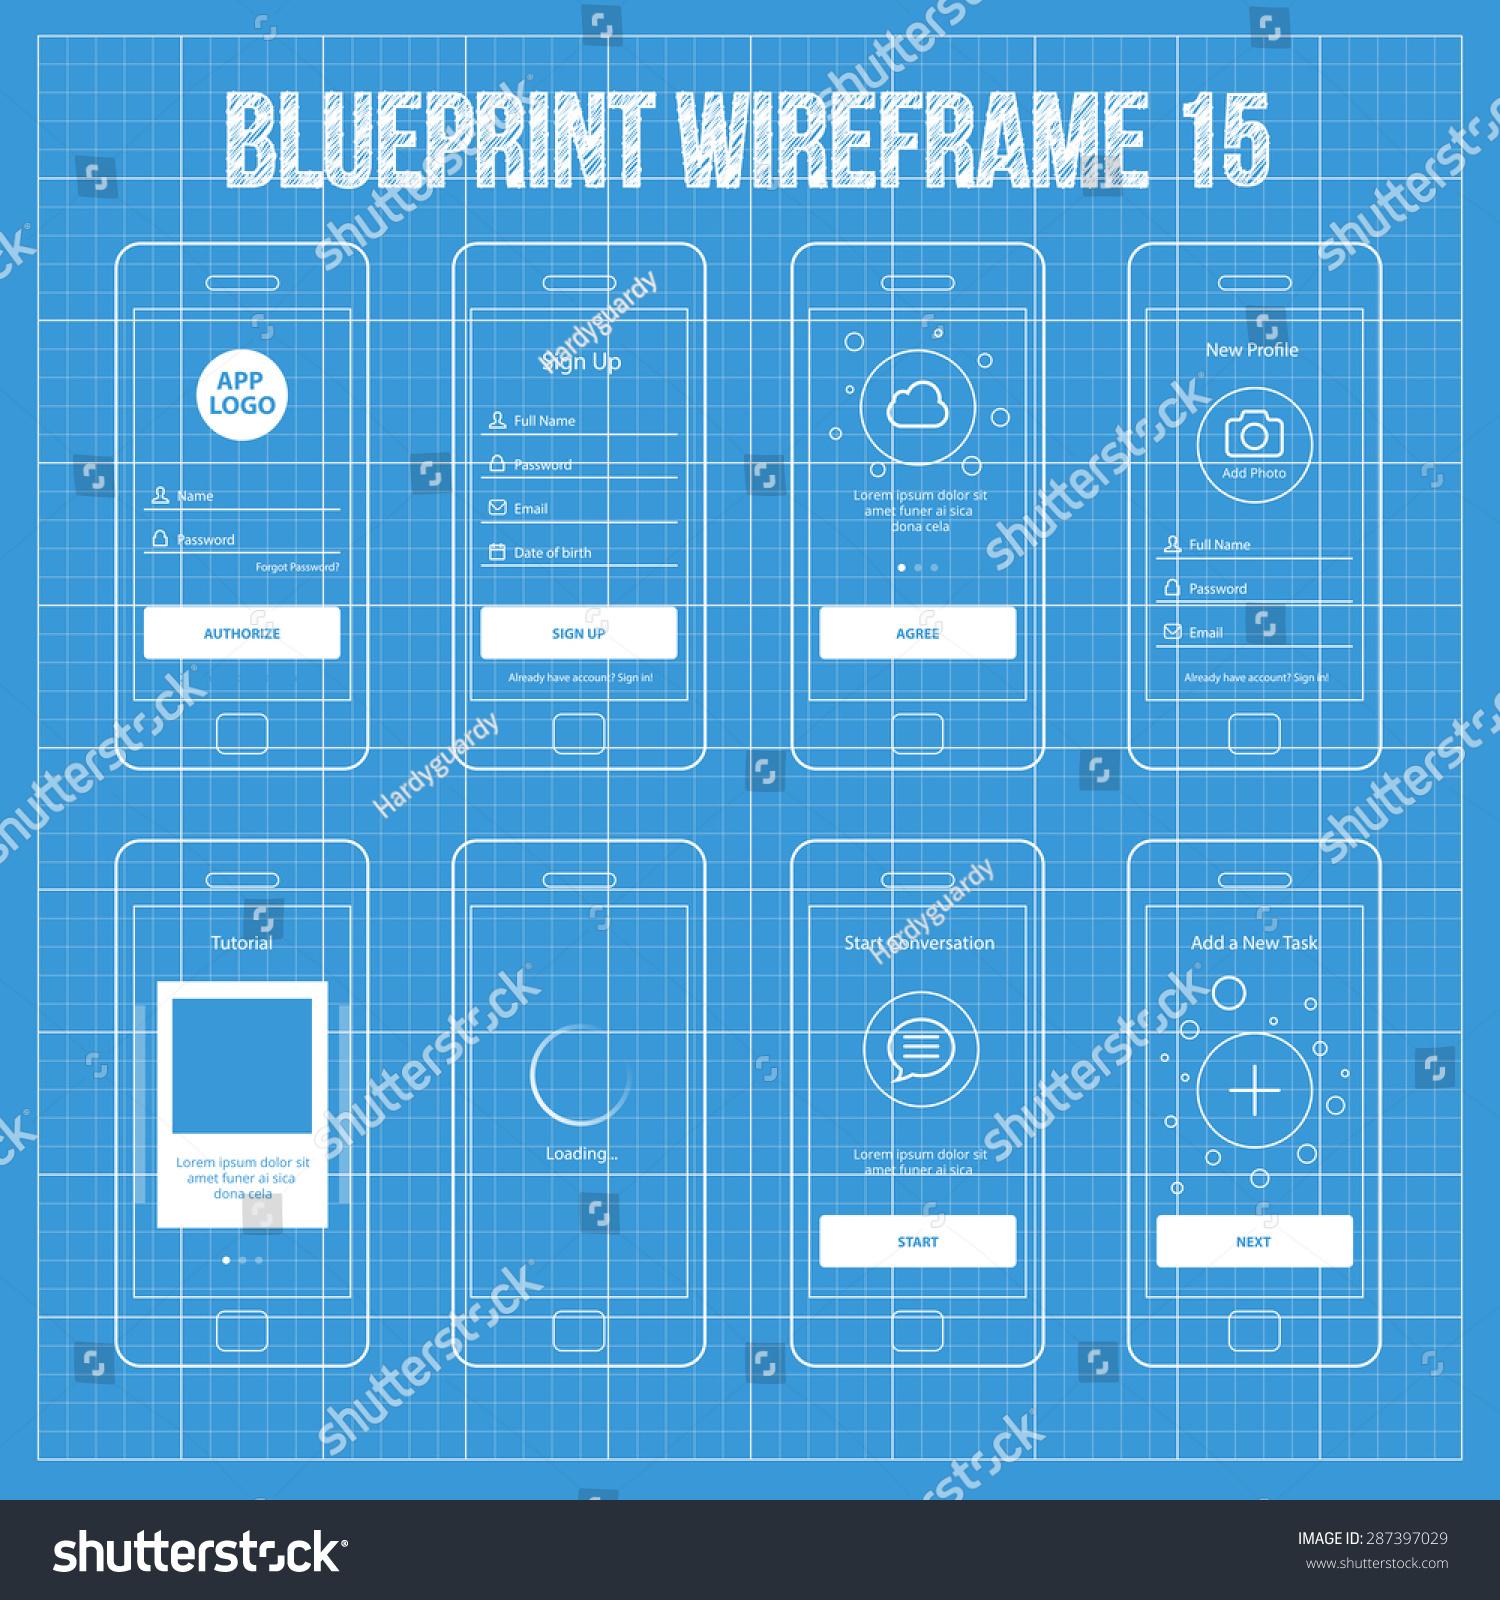 Mobile app blueprint wireframe ui kit 15 sign up screen for App for blueprints